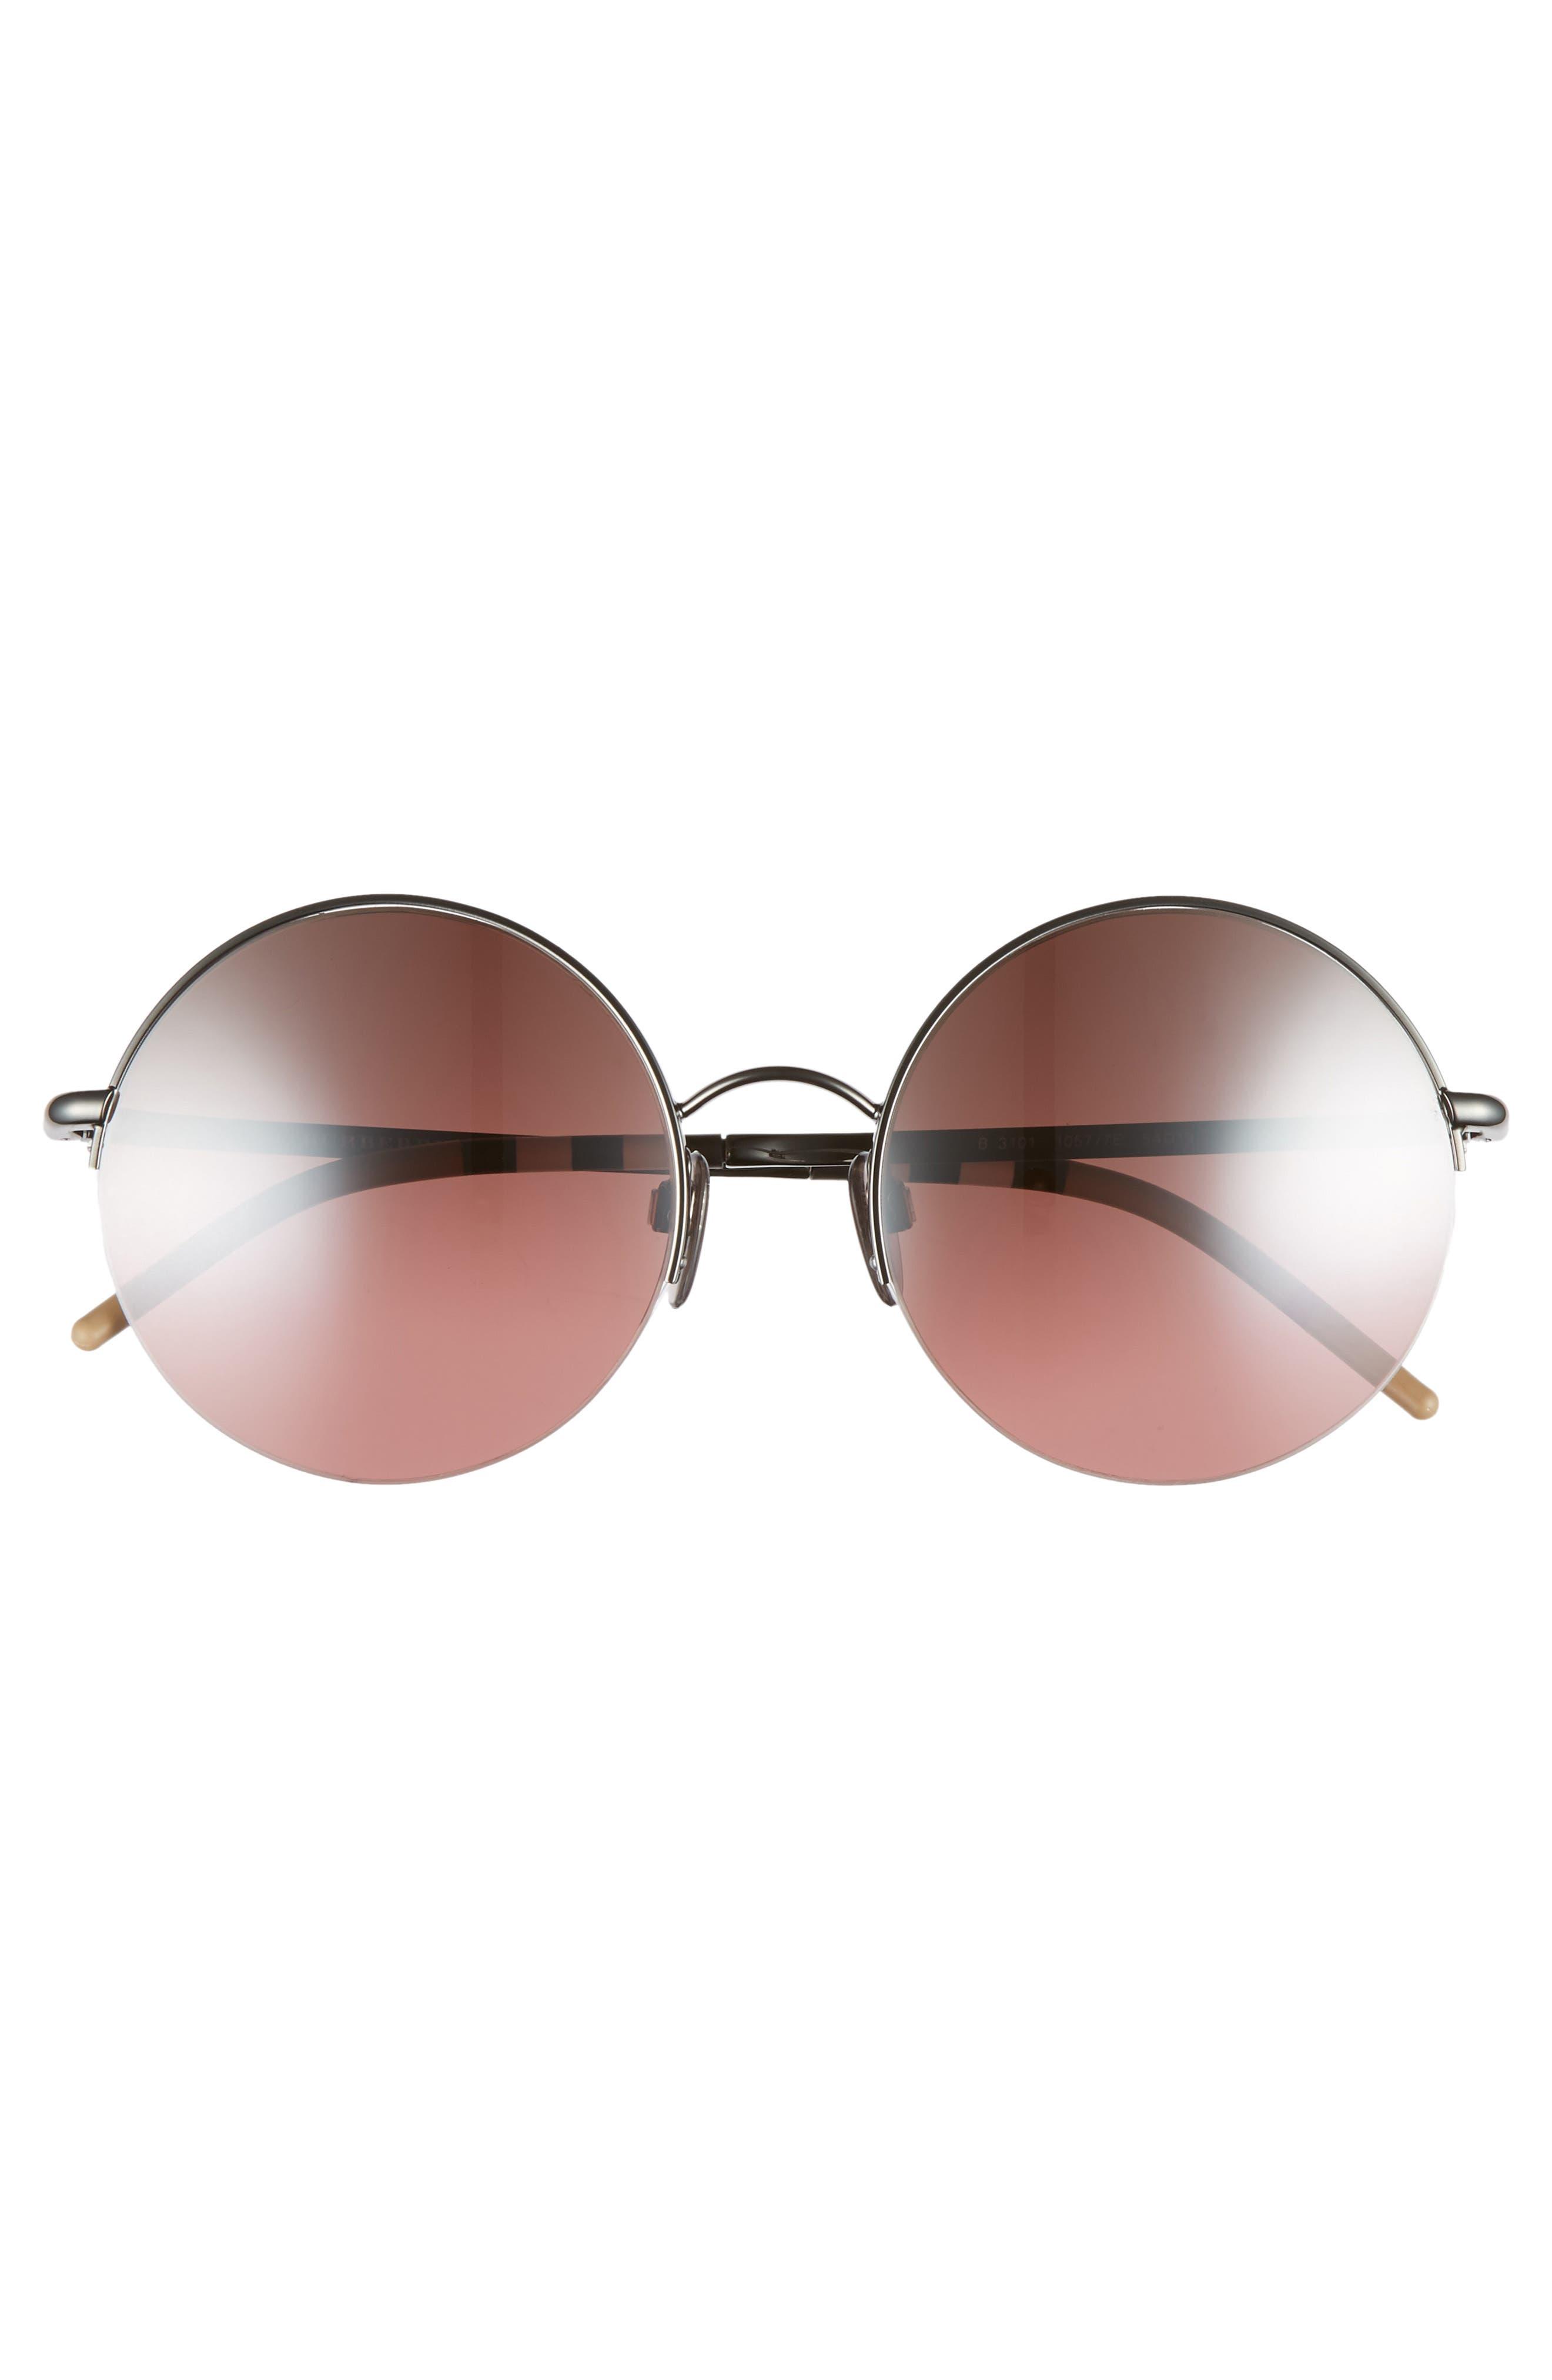 54mm Round Sunglasses,                             Alternate thumbnail 4, color,                             001